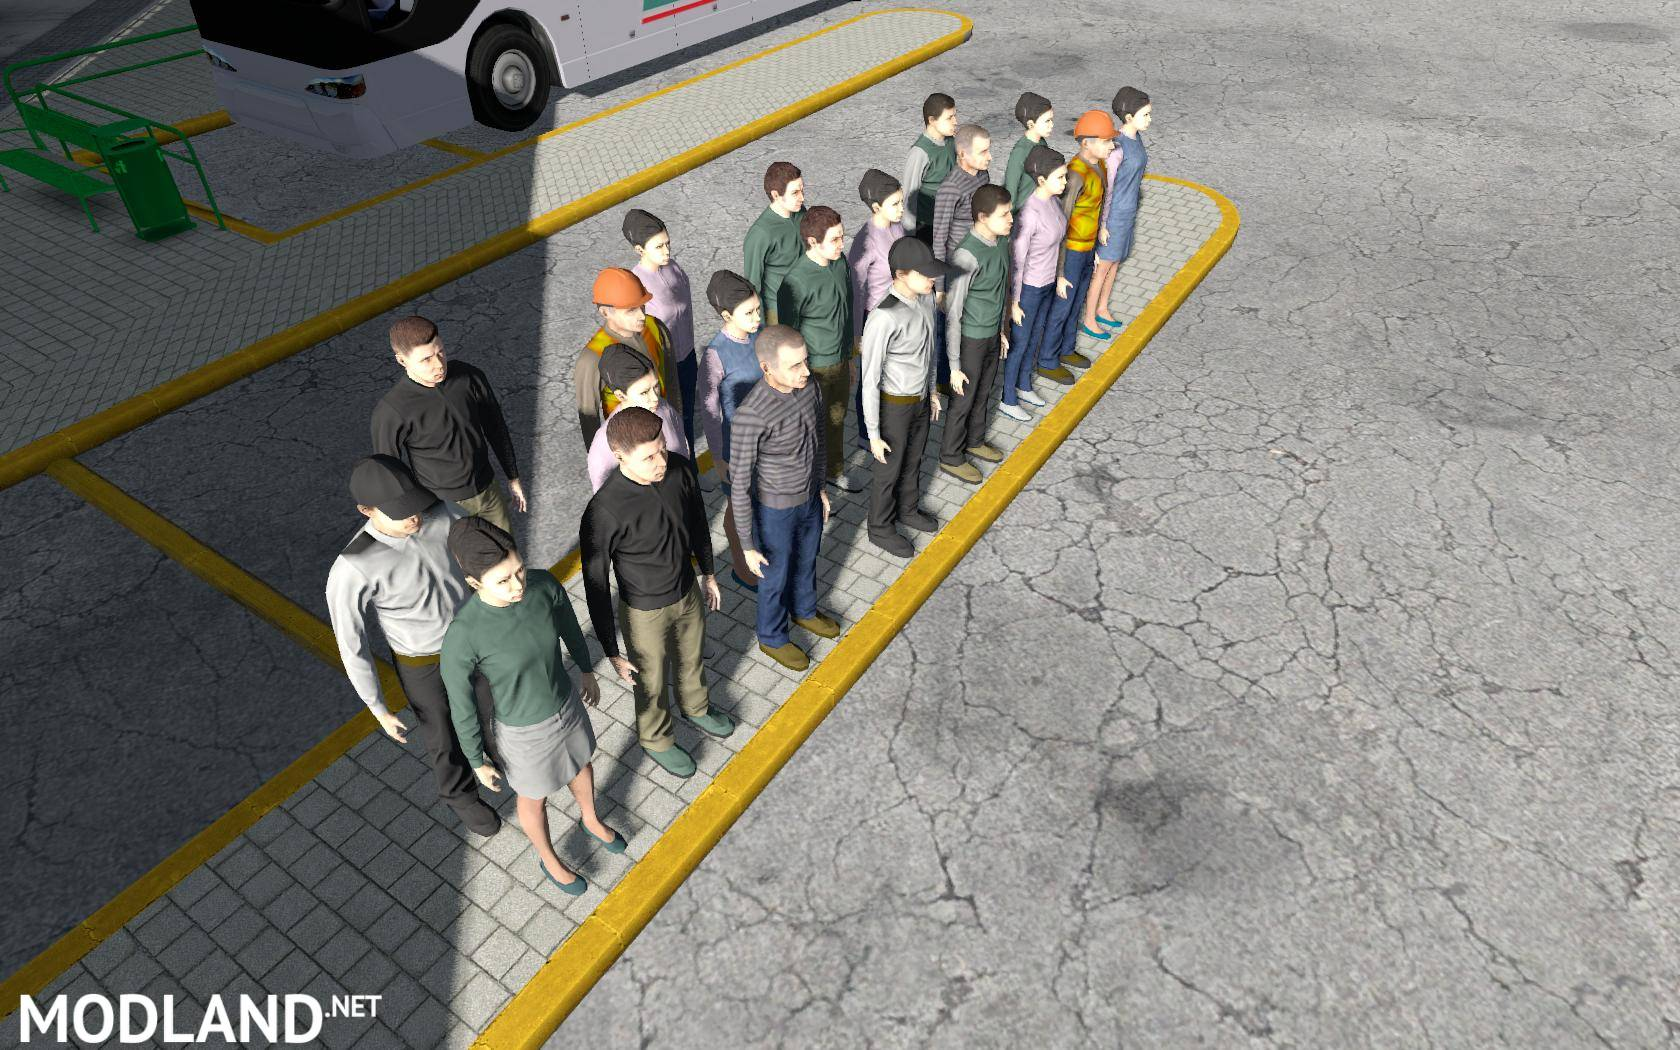 Passenger Mod v1 0 (1 28, 1 30) mod for ETS 2